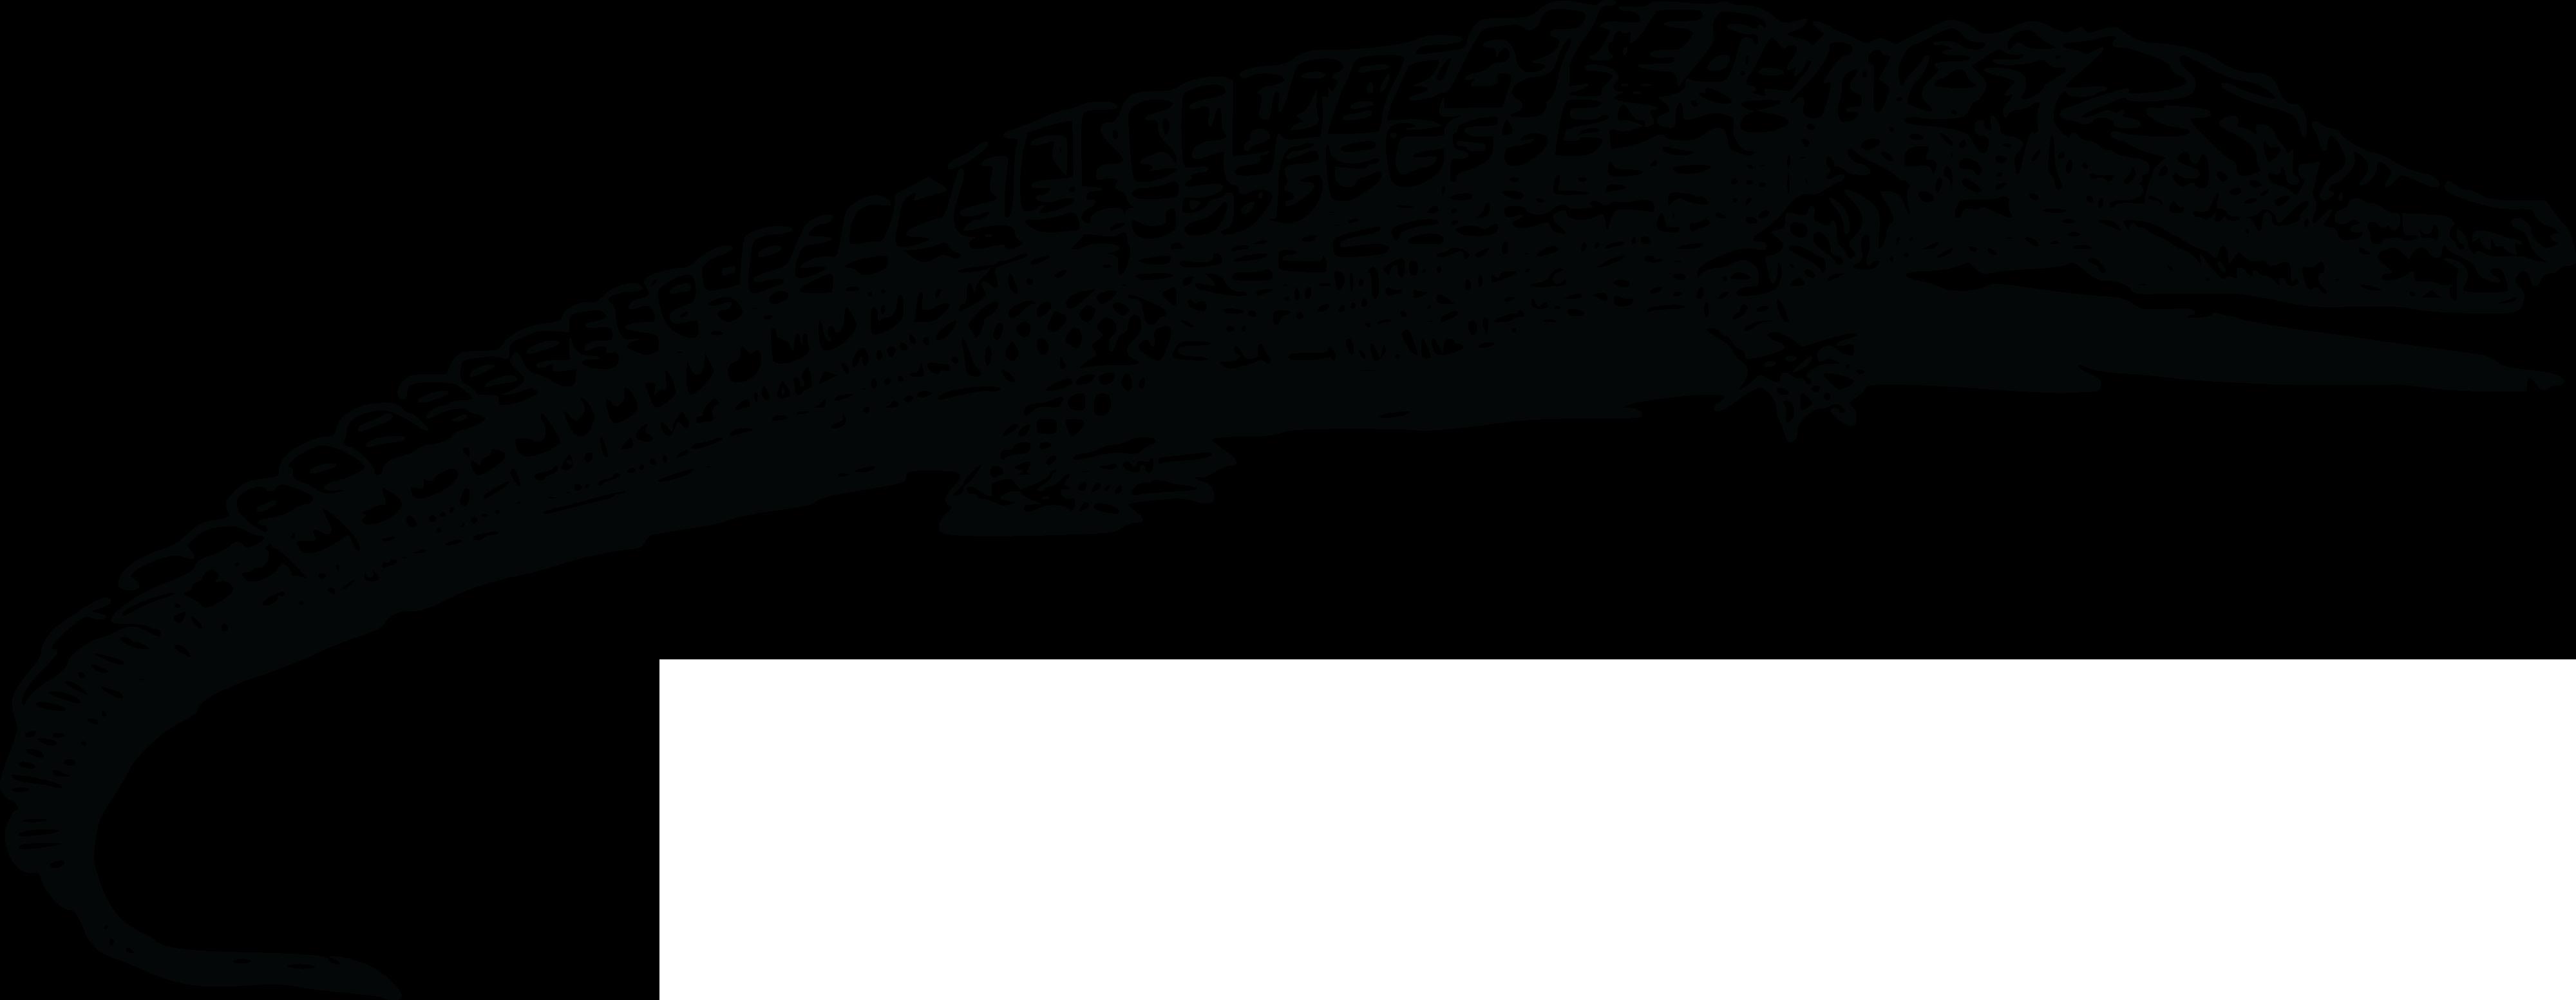 PNG Crocodile Black And White - 133444